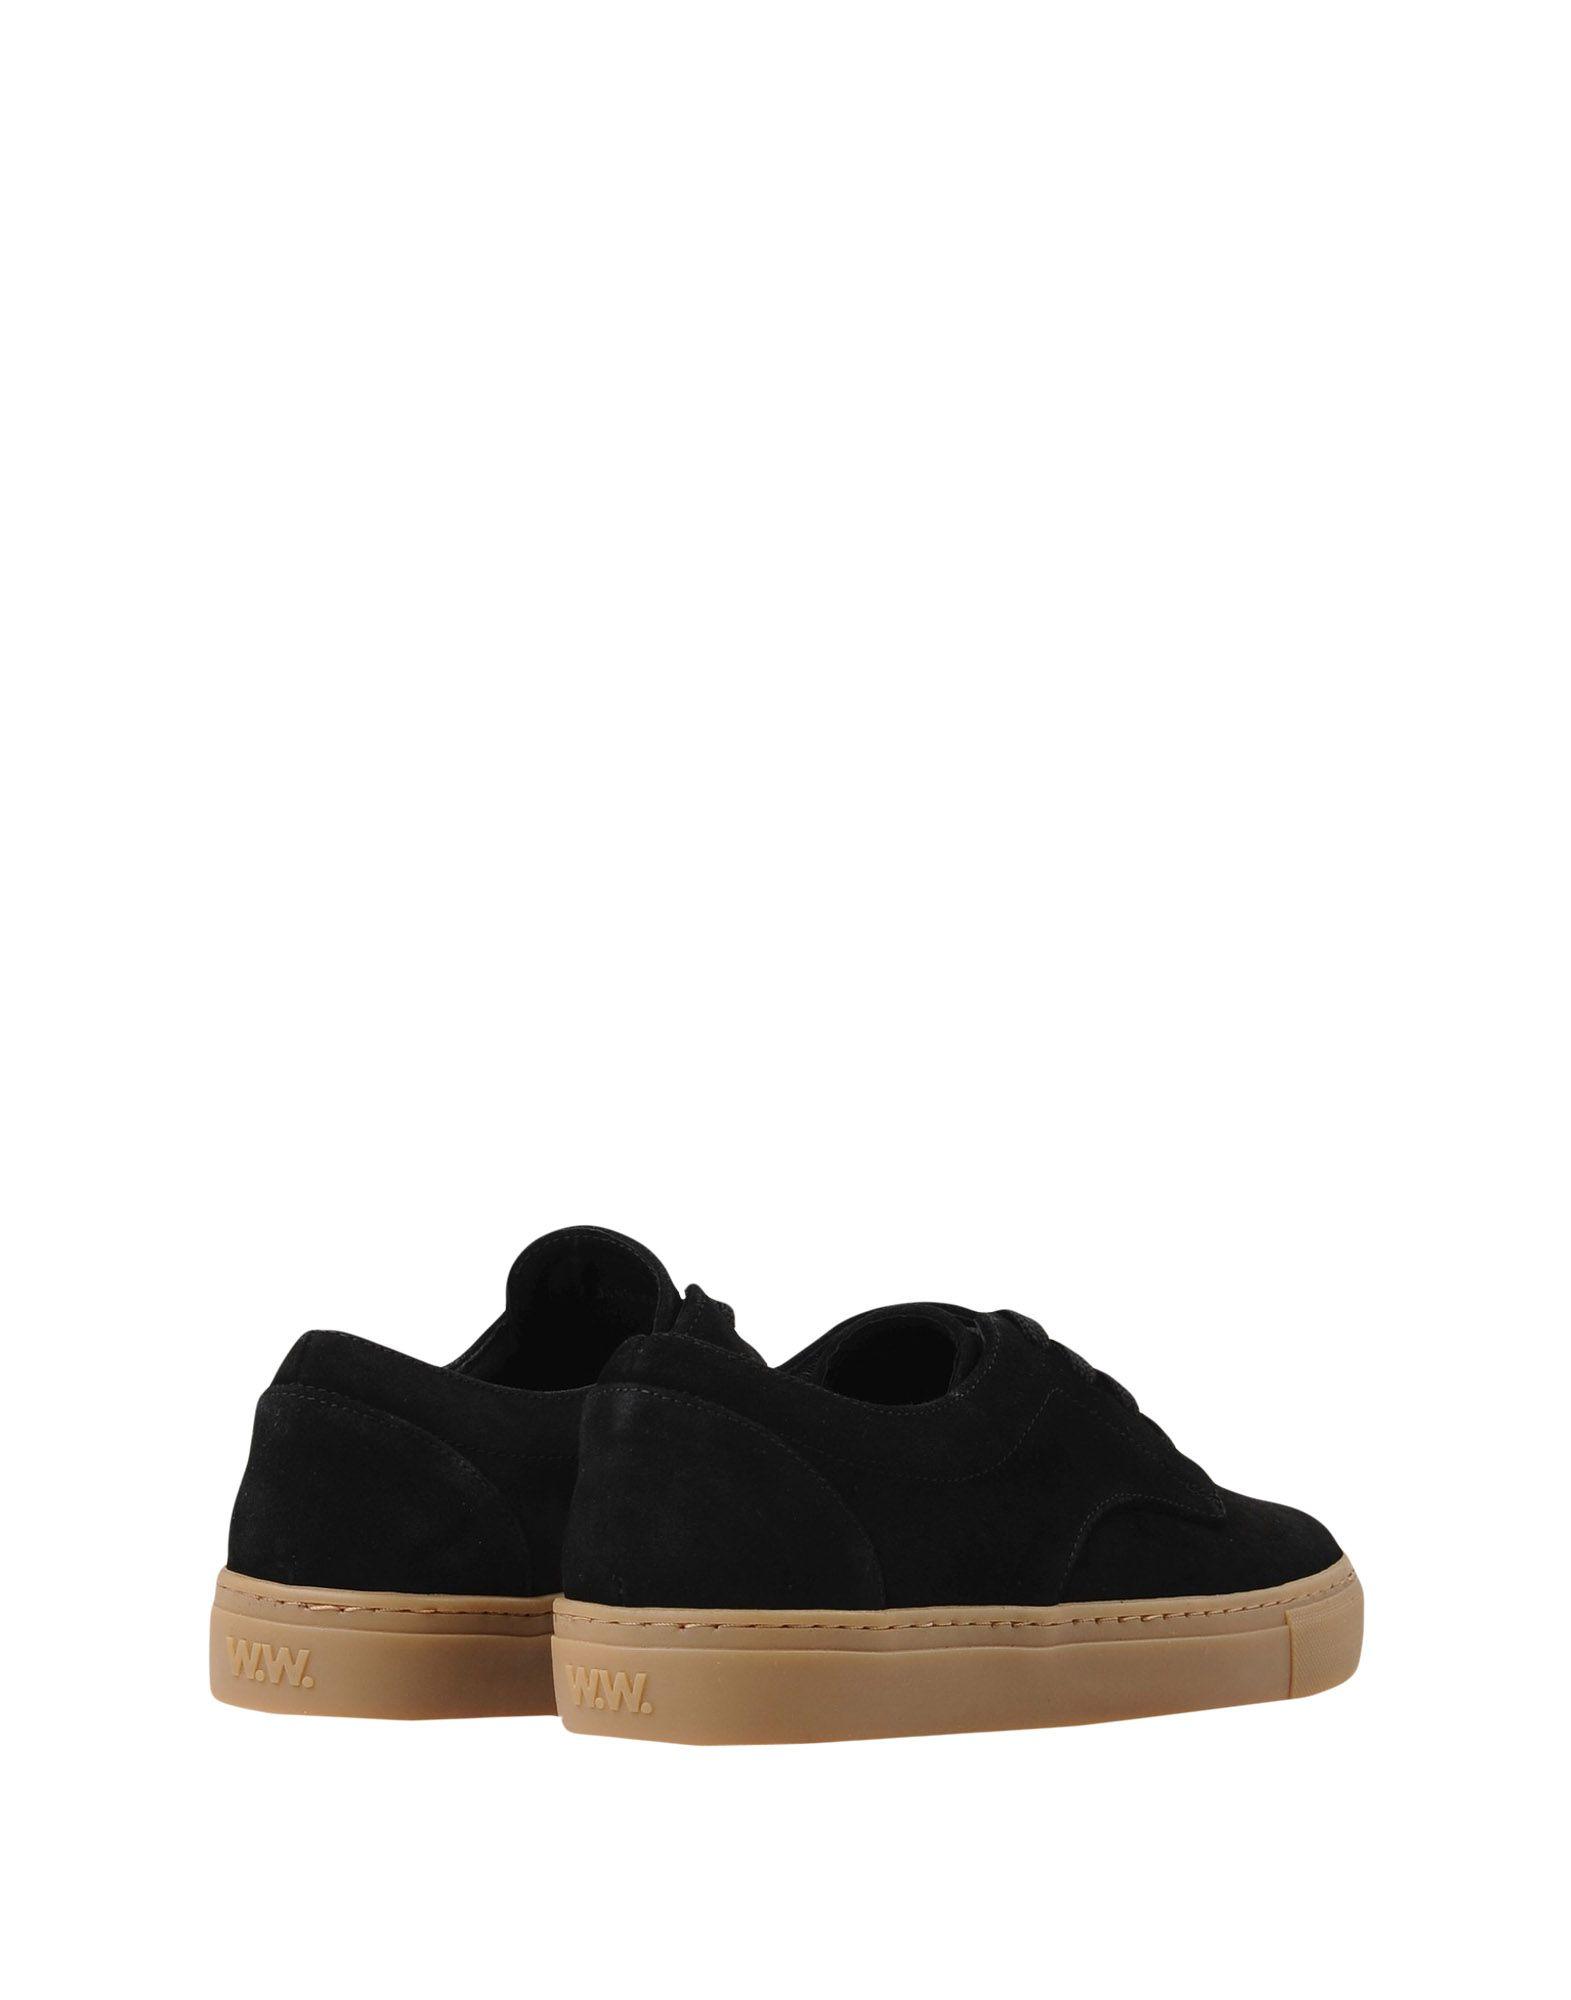 Sneakers Wood Wood Drew Shoe Unisex Shoes - Uomo - 11458464WS